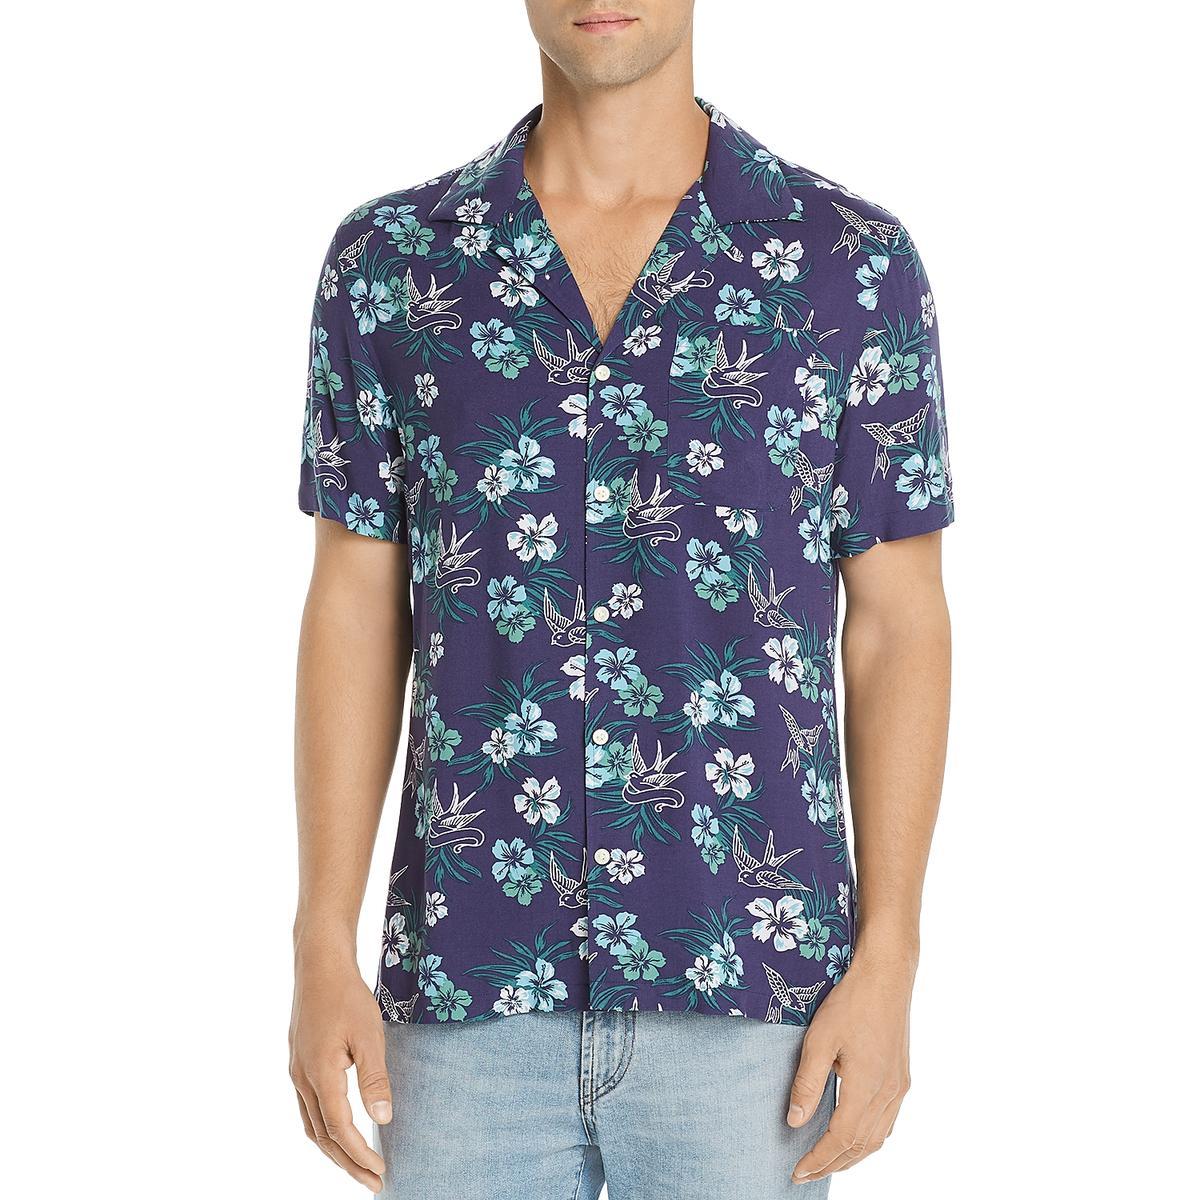 Jachs NY Mens Navy Floral Button Down Hawaiian Print Shirt S BHFO 7261